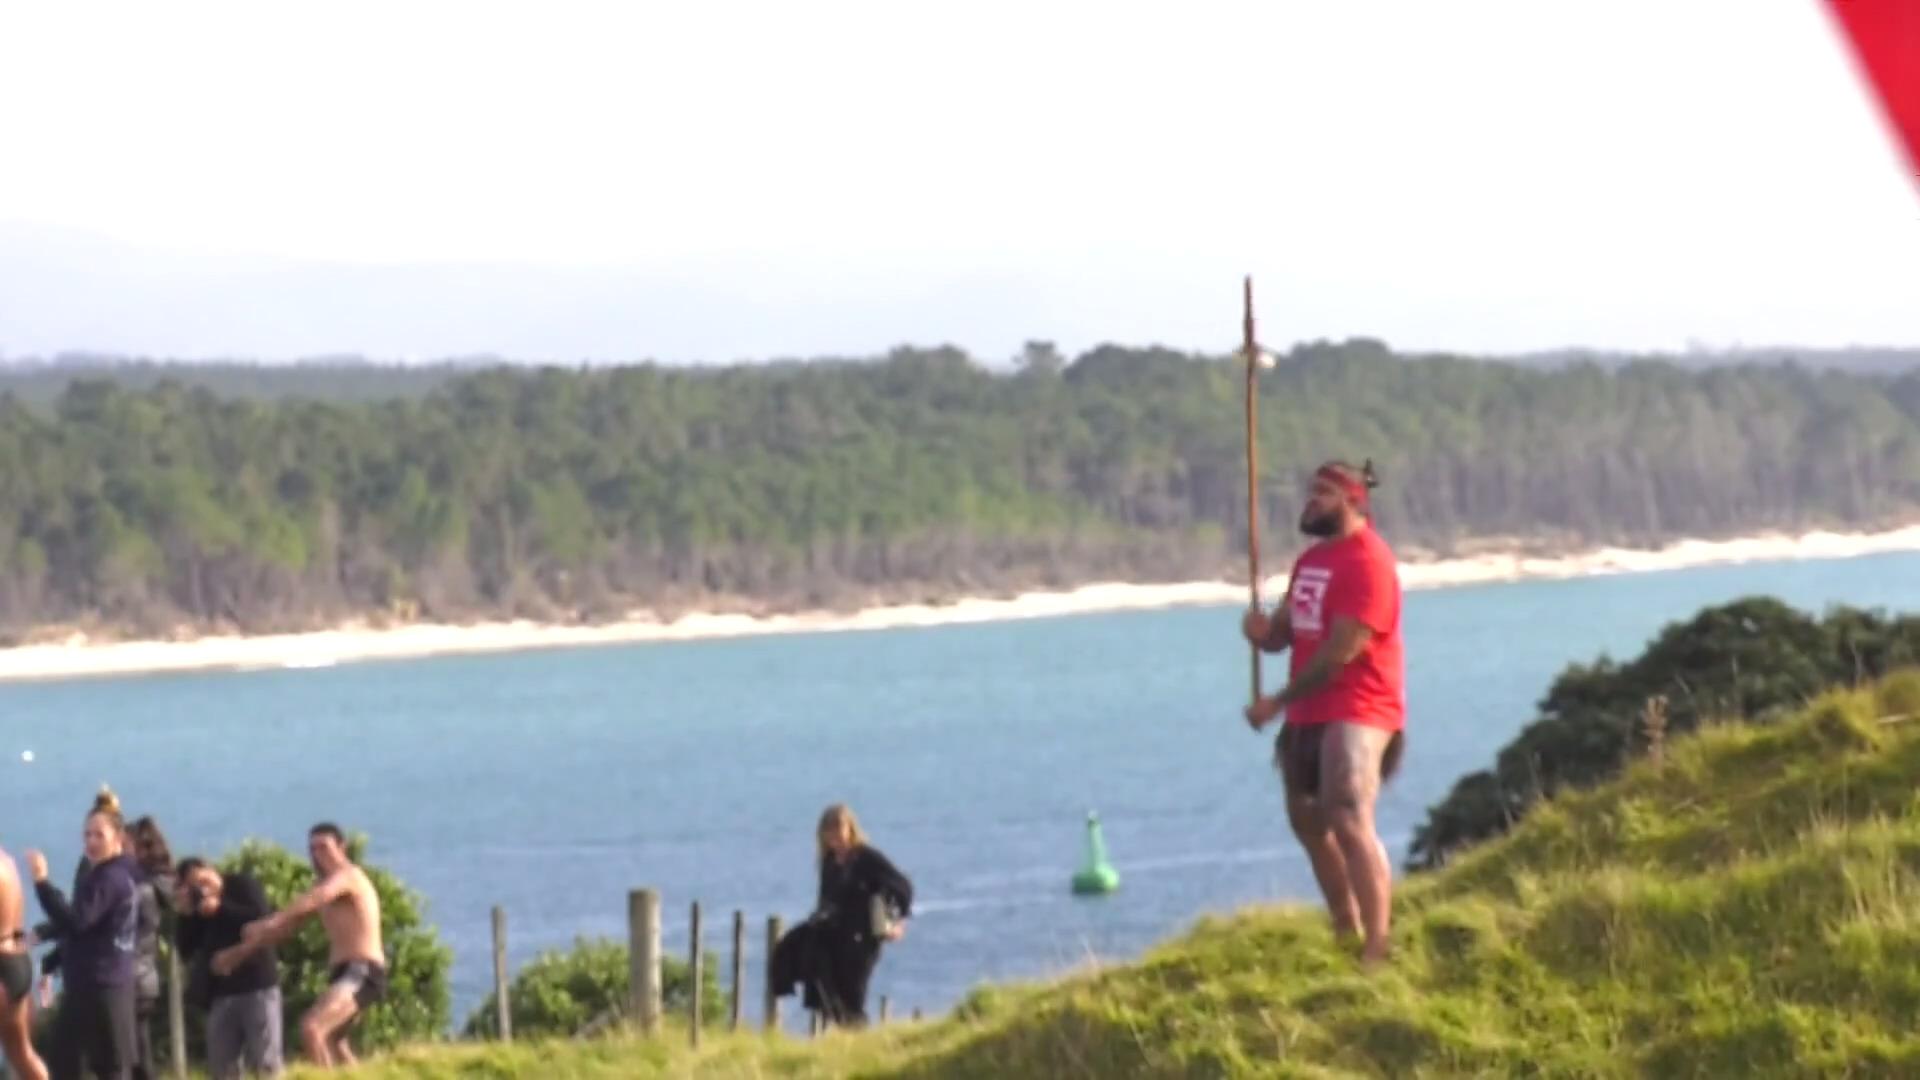 Video for Deadline to contest Hauraki Claim within Tauranga extended